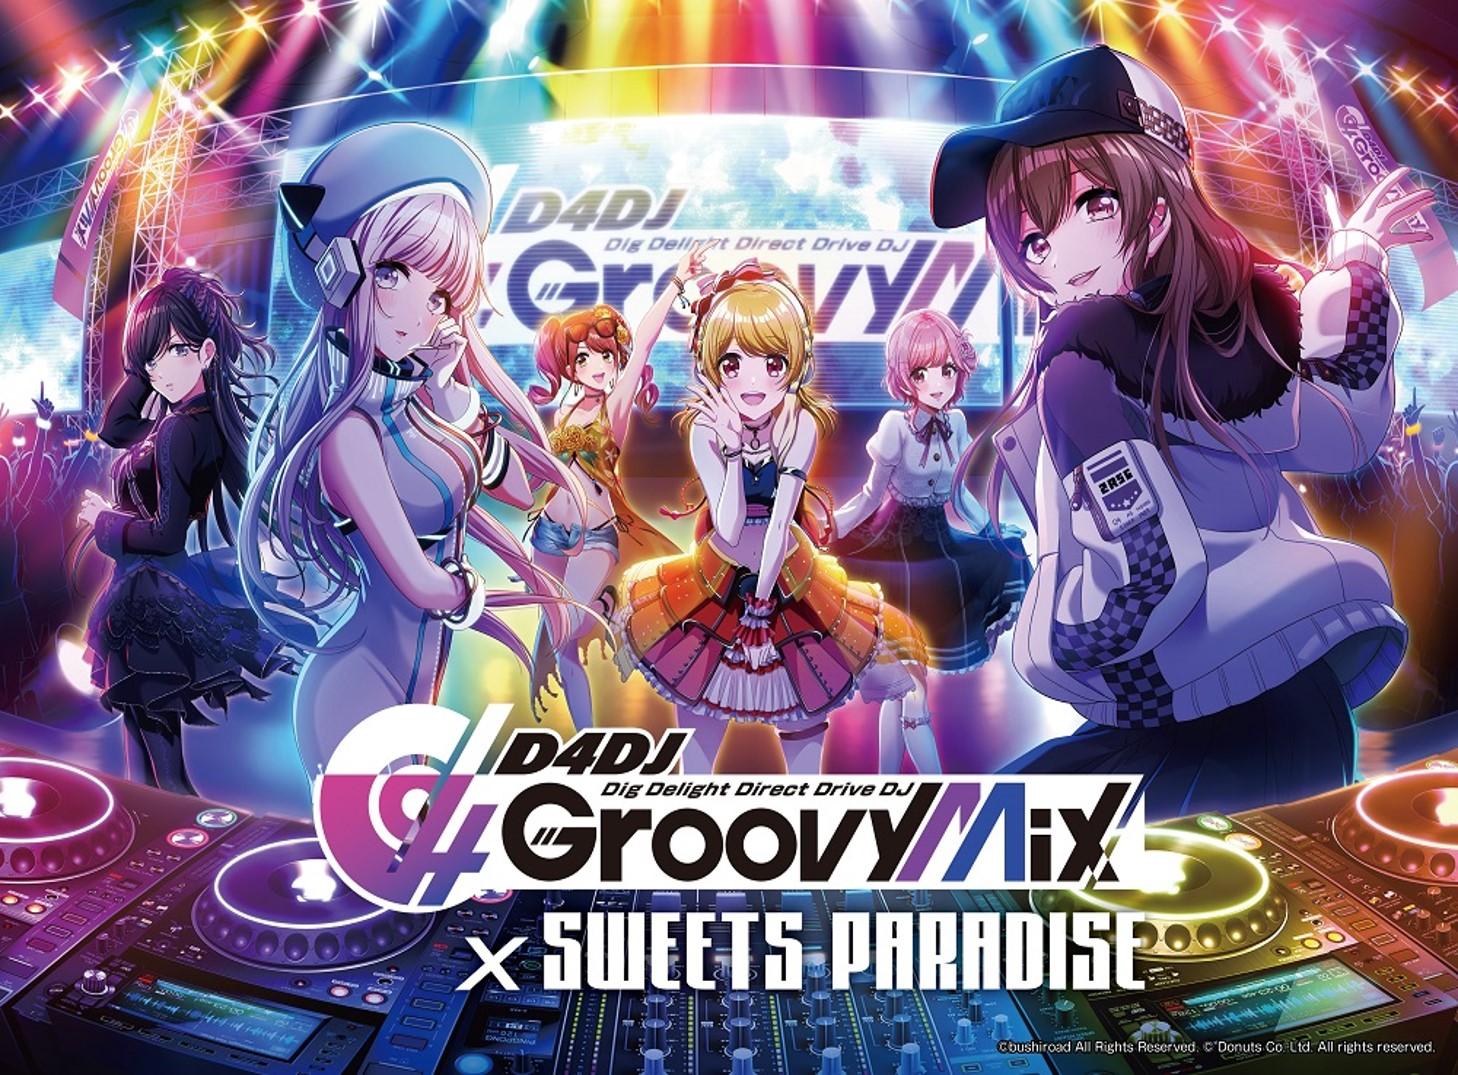 「D4DJ Groovy Mix」とスイーツパラダイスとのコラボカフェ開催中!